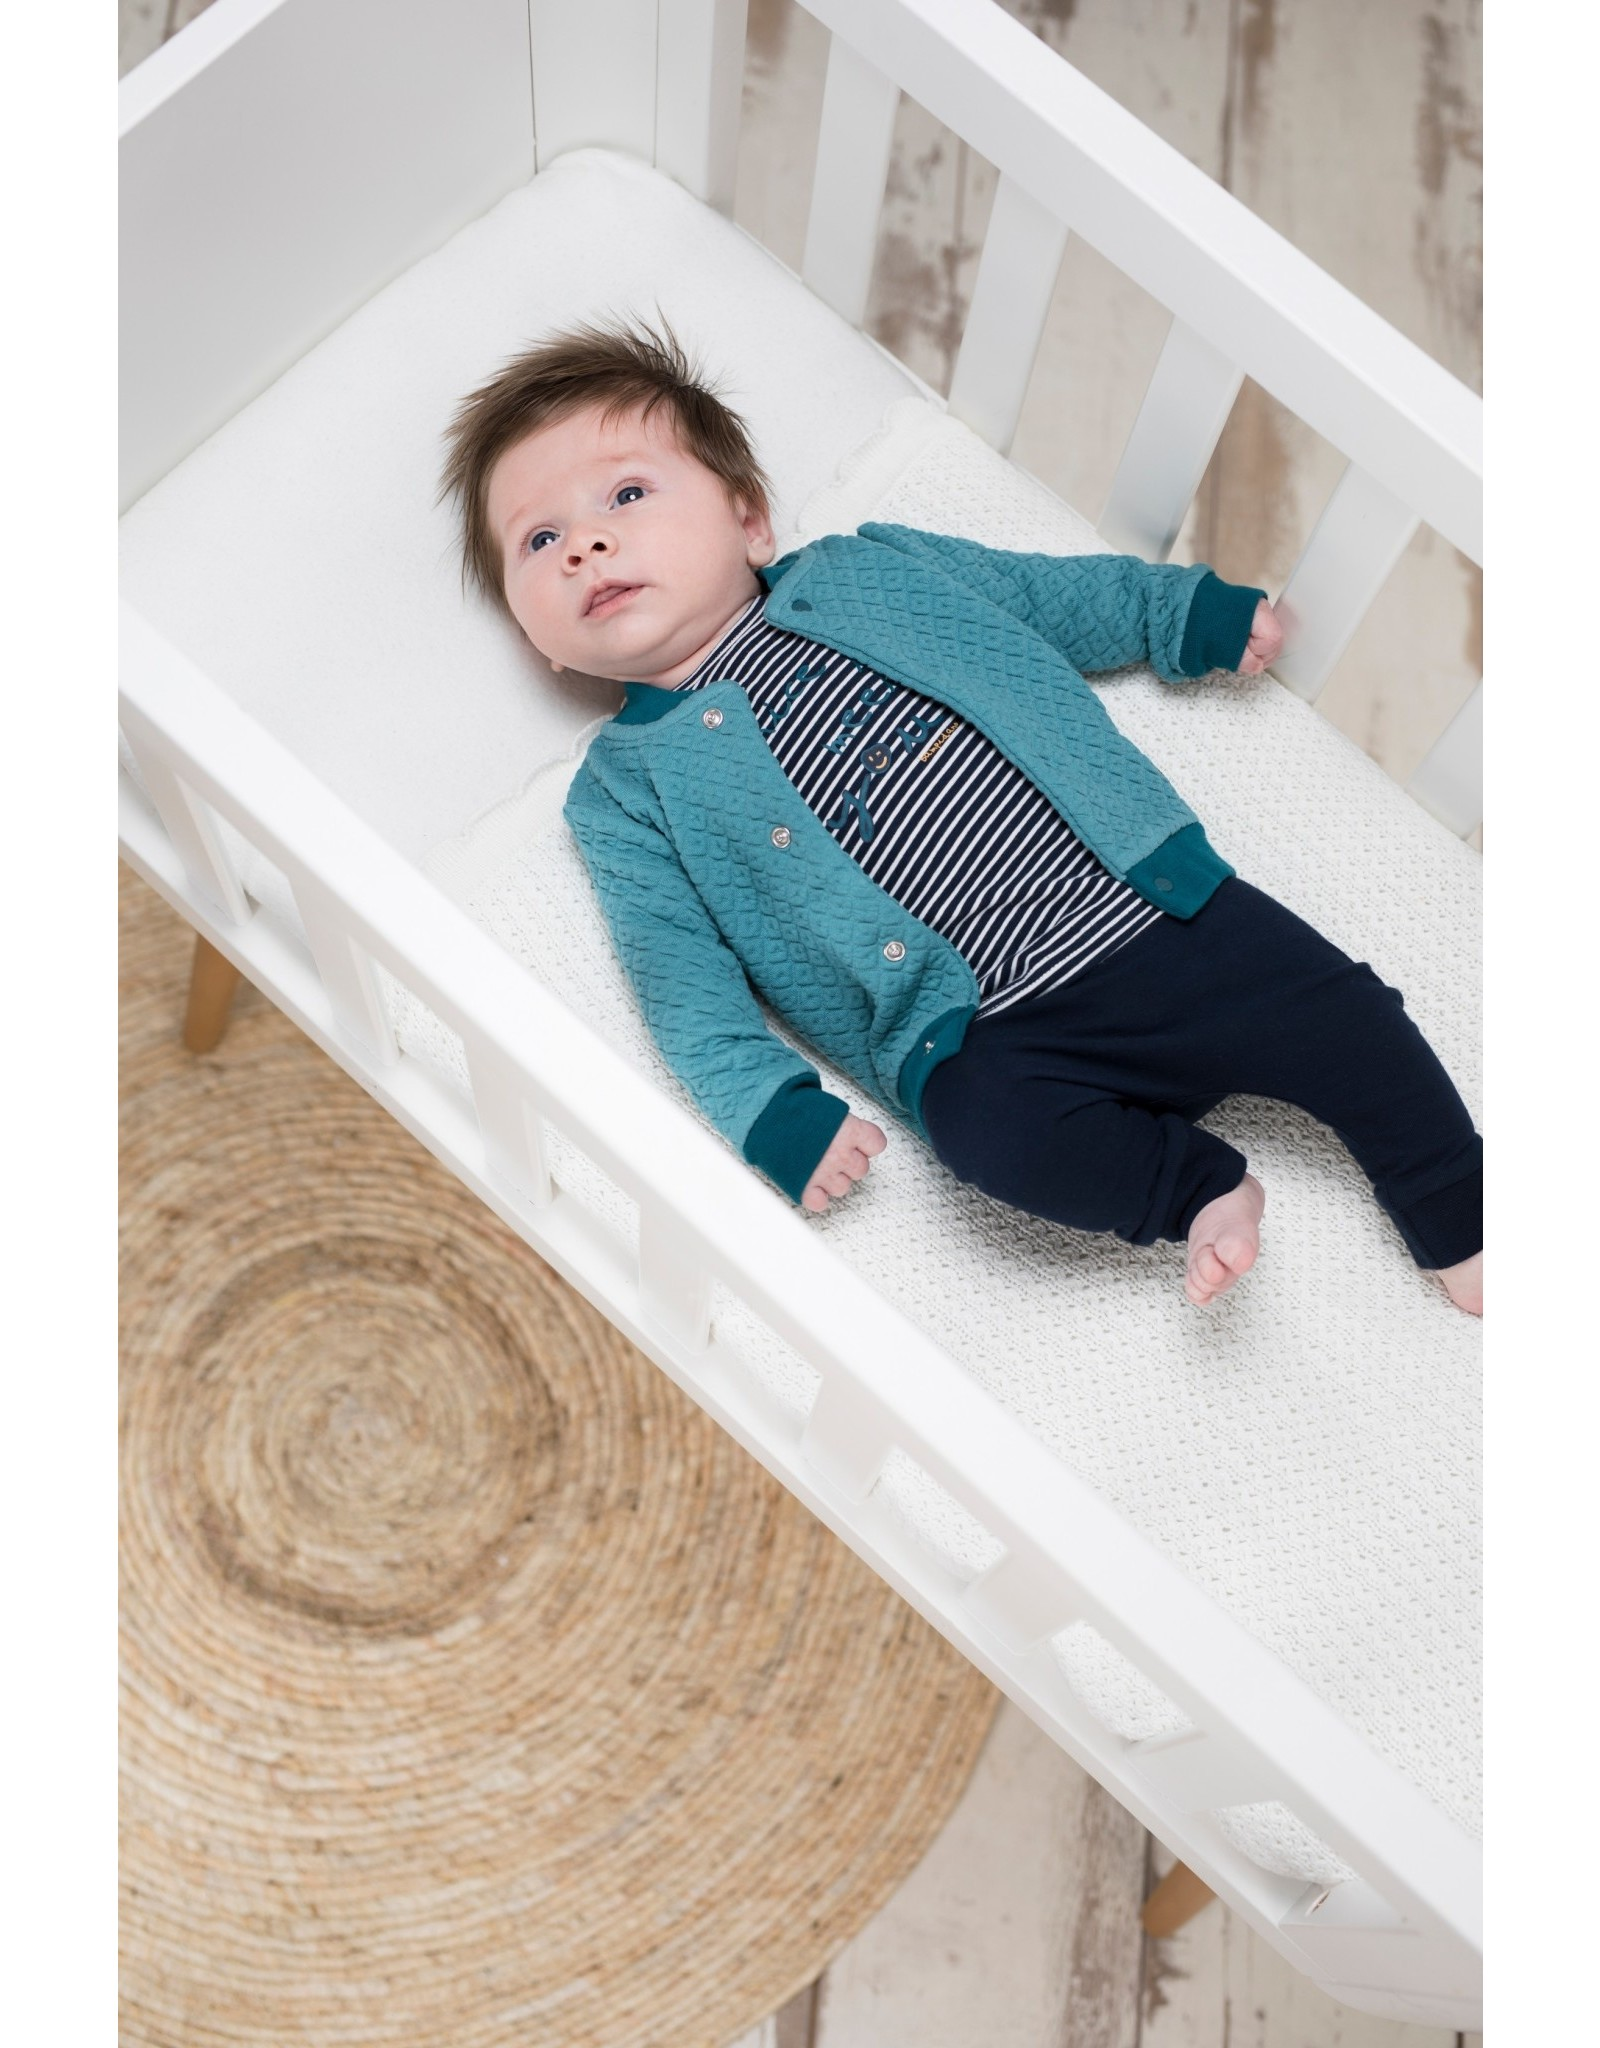 Bampidano Bampidano New Born baby jongens shirt Avery Clouds Stripe Navy